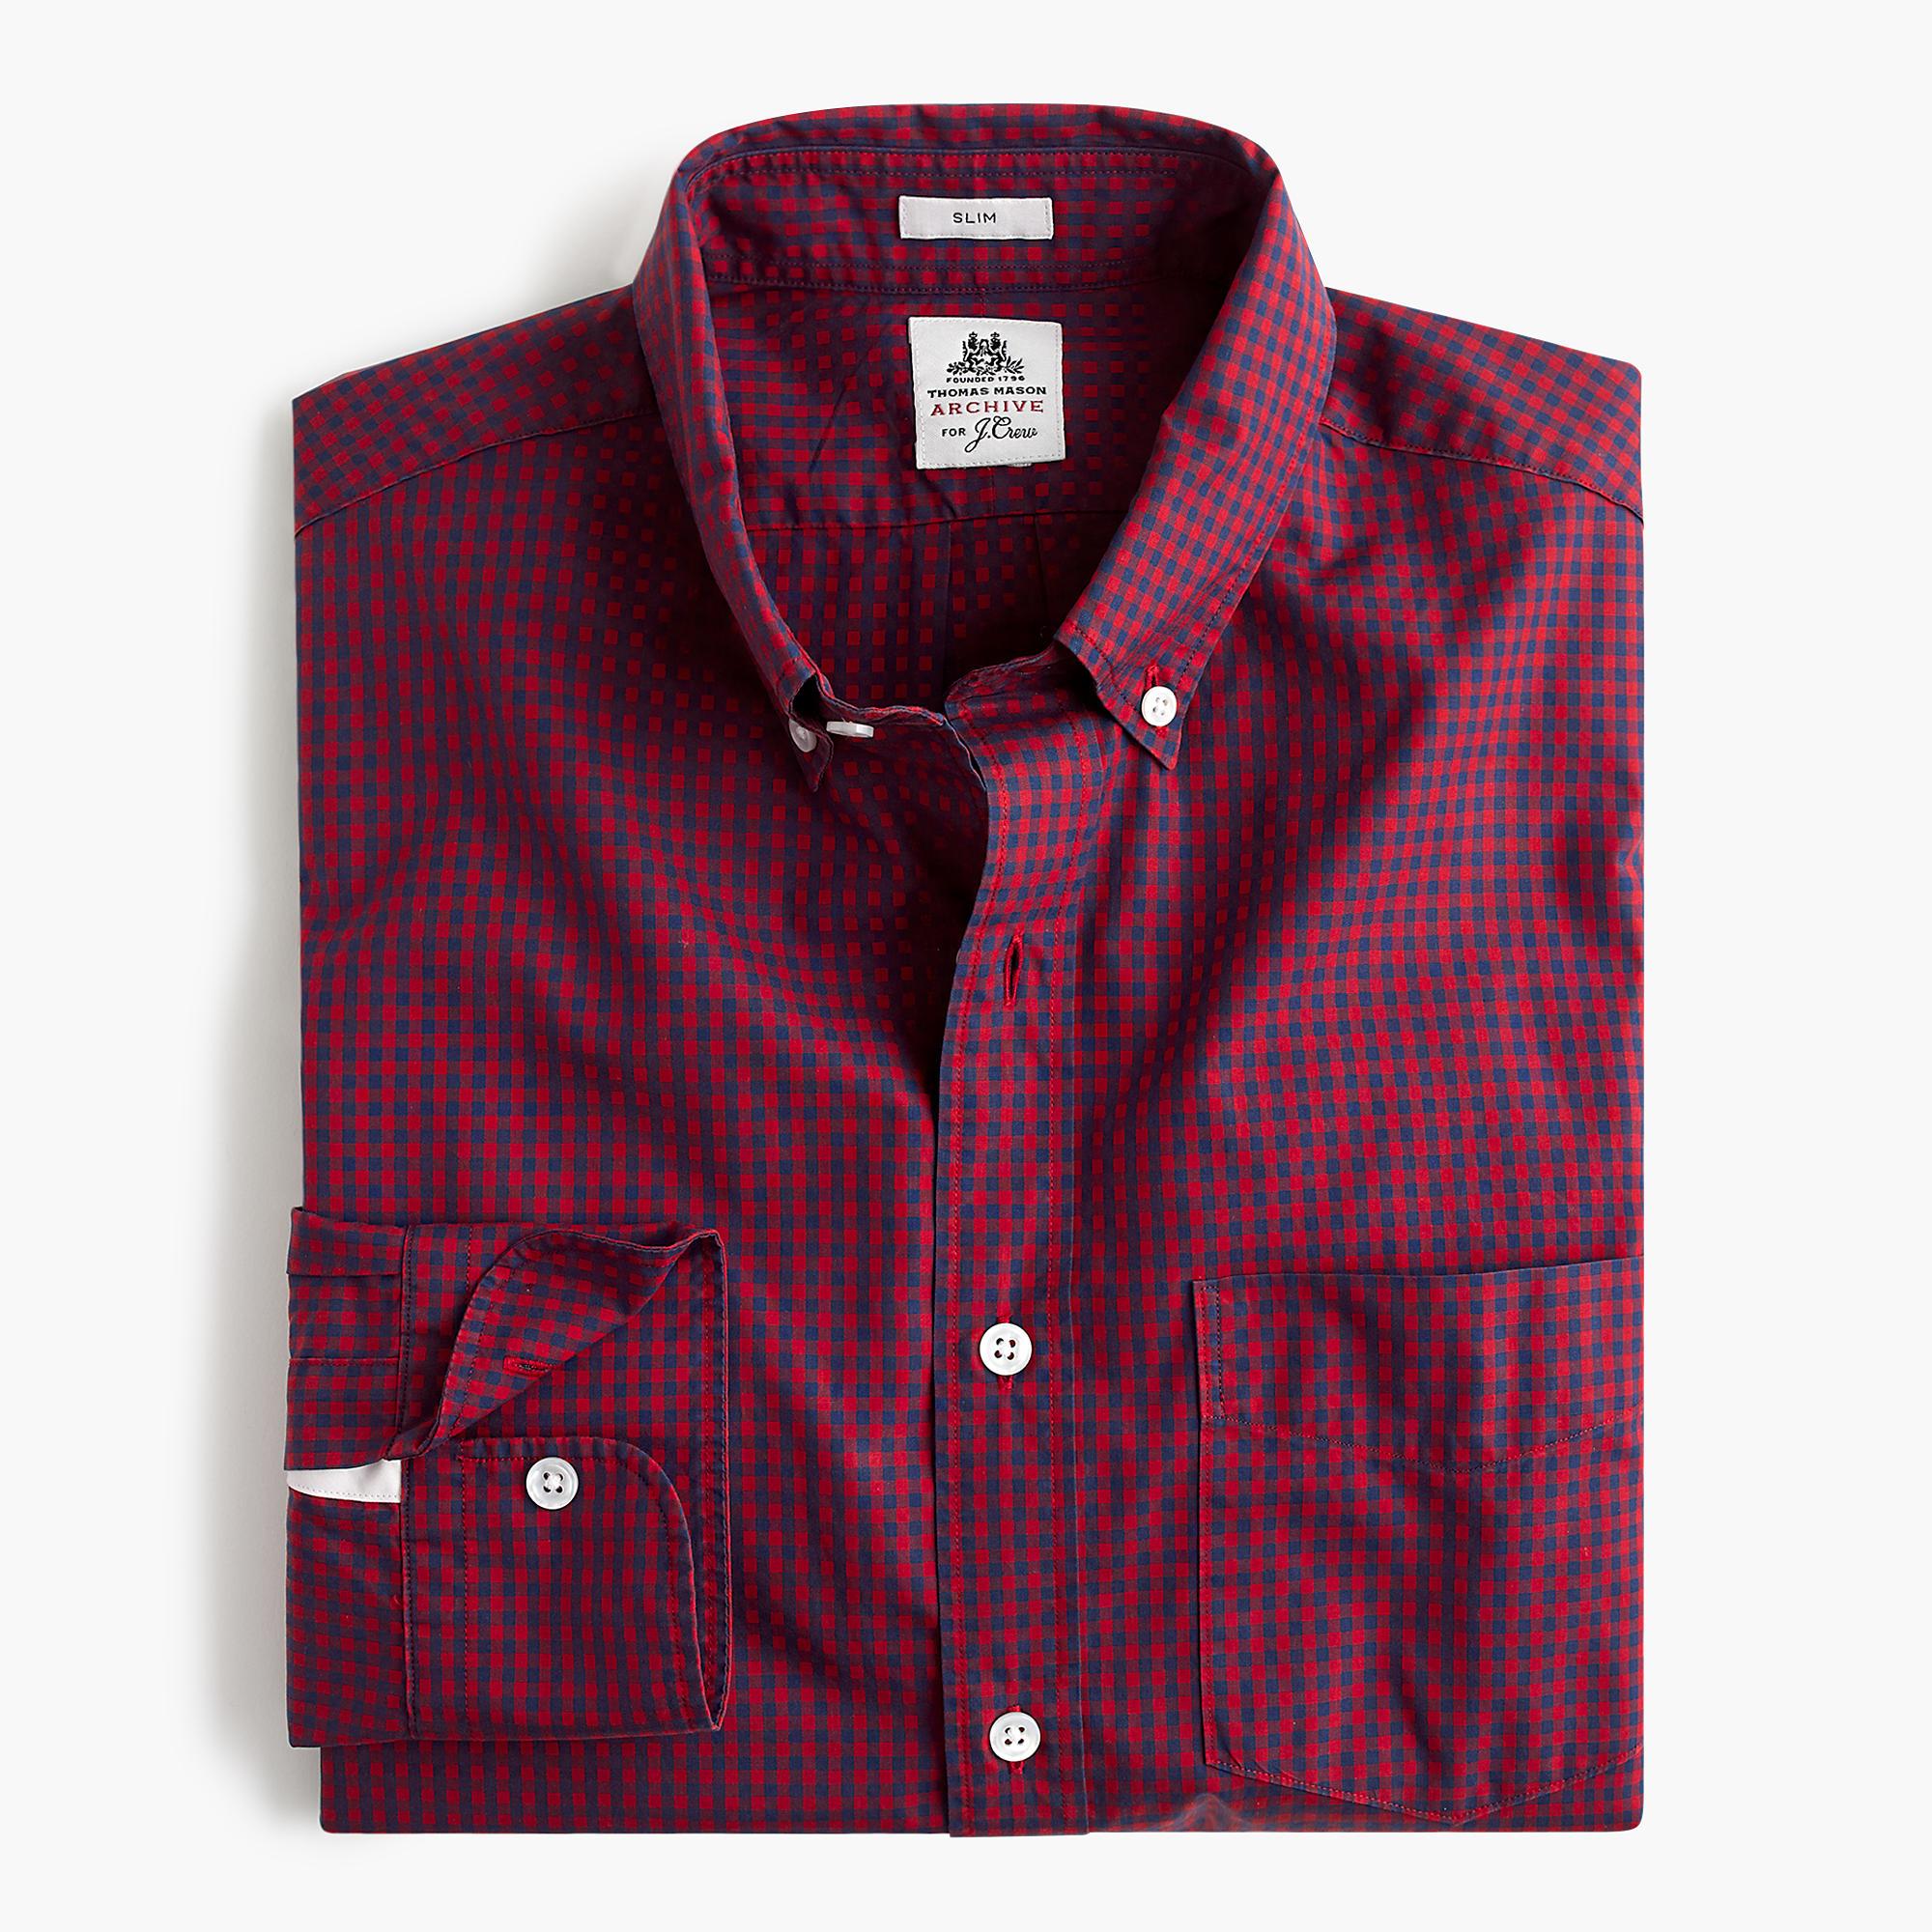 Slim thomas mason shirt in danbury red gingham in for Thomas mason dress shirts